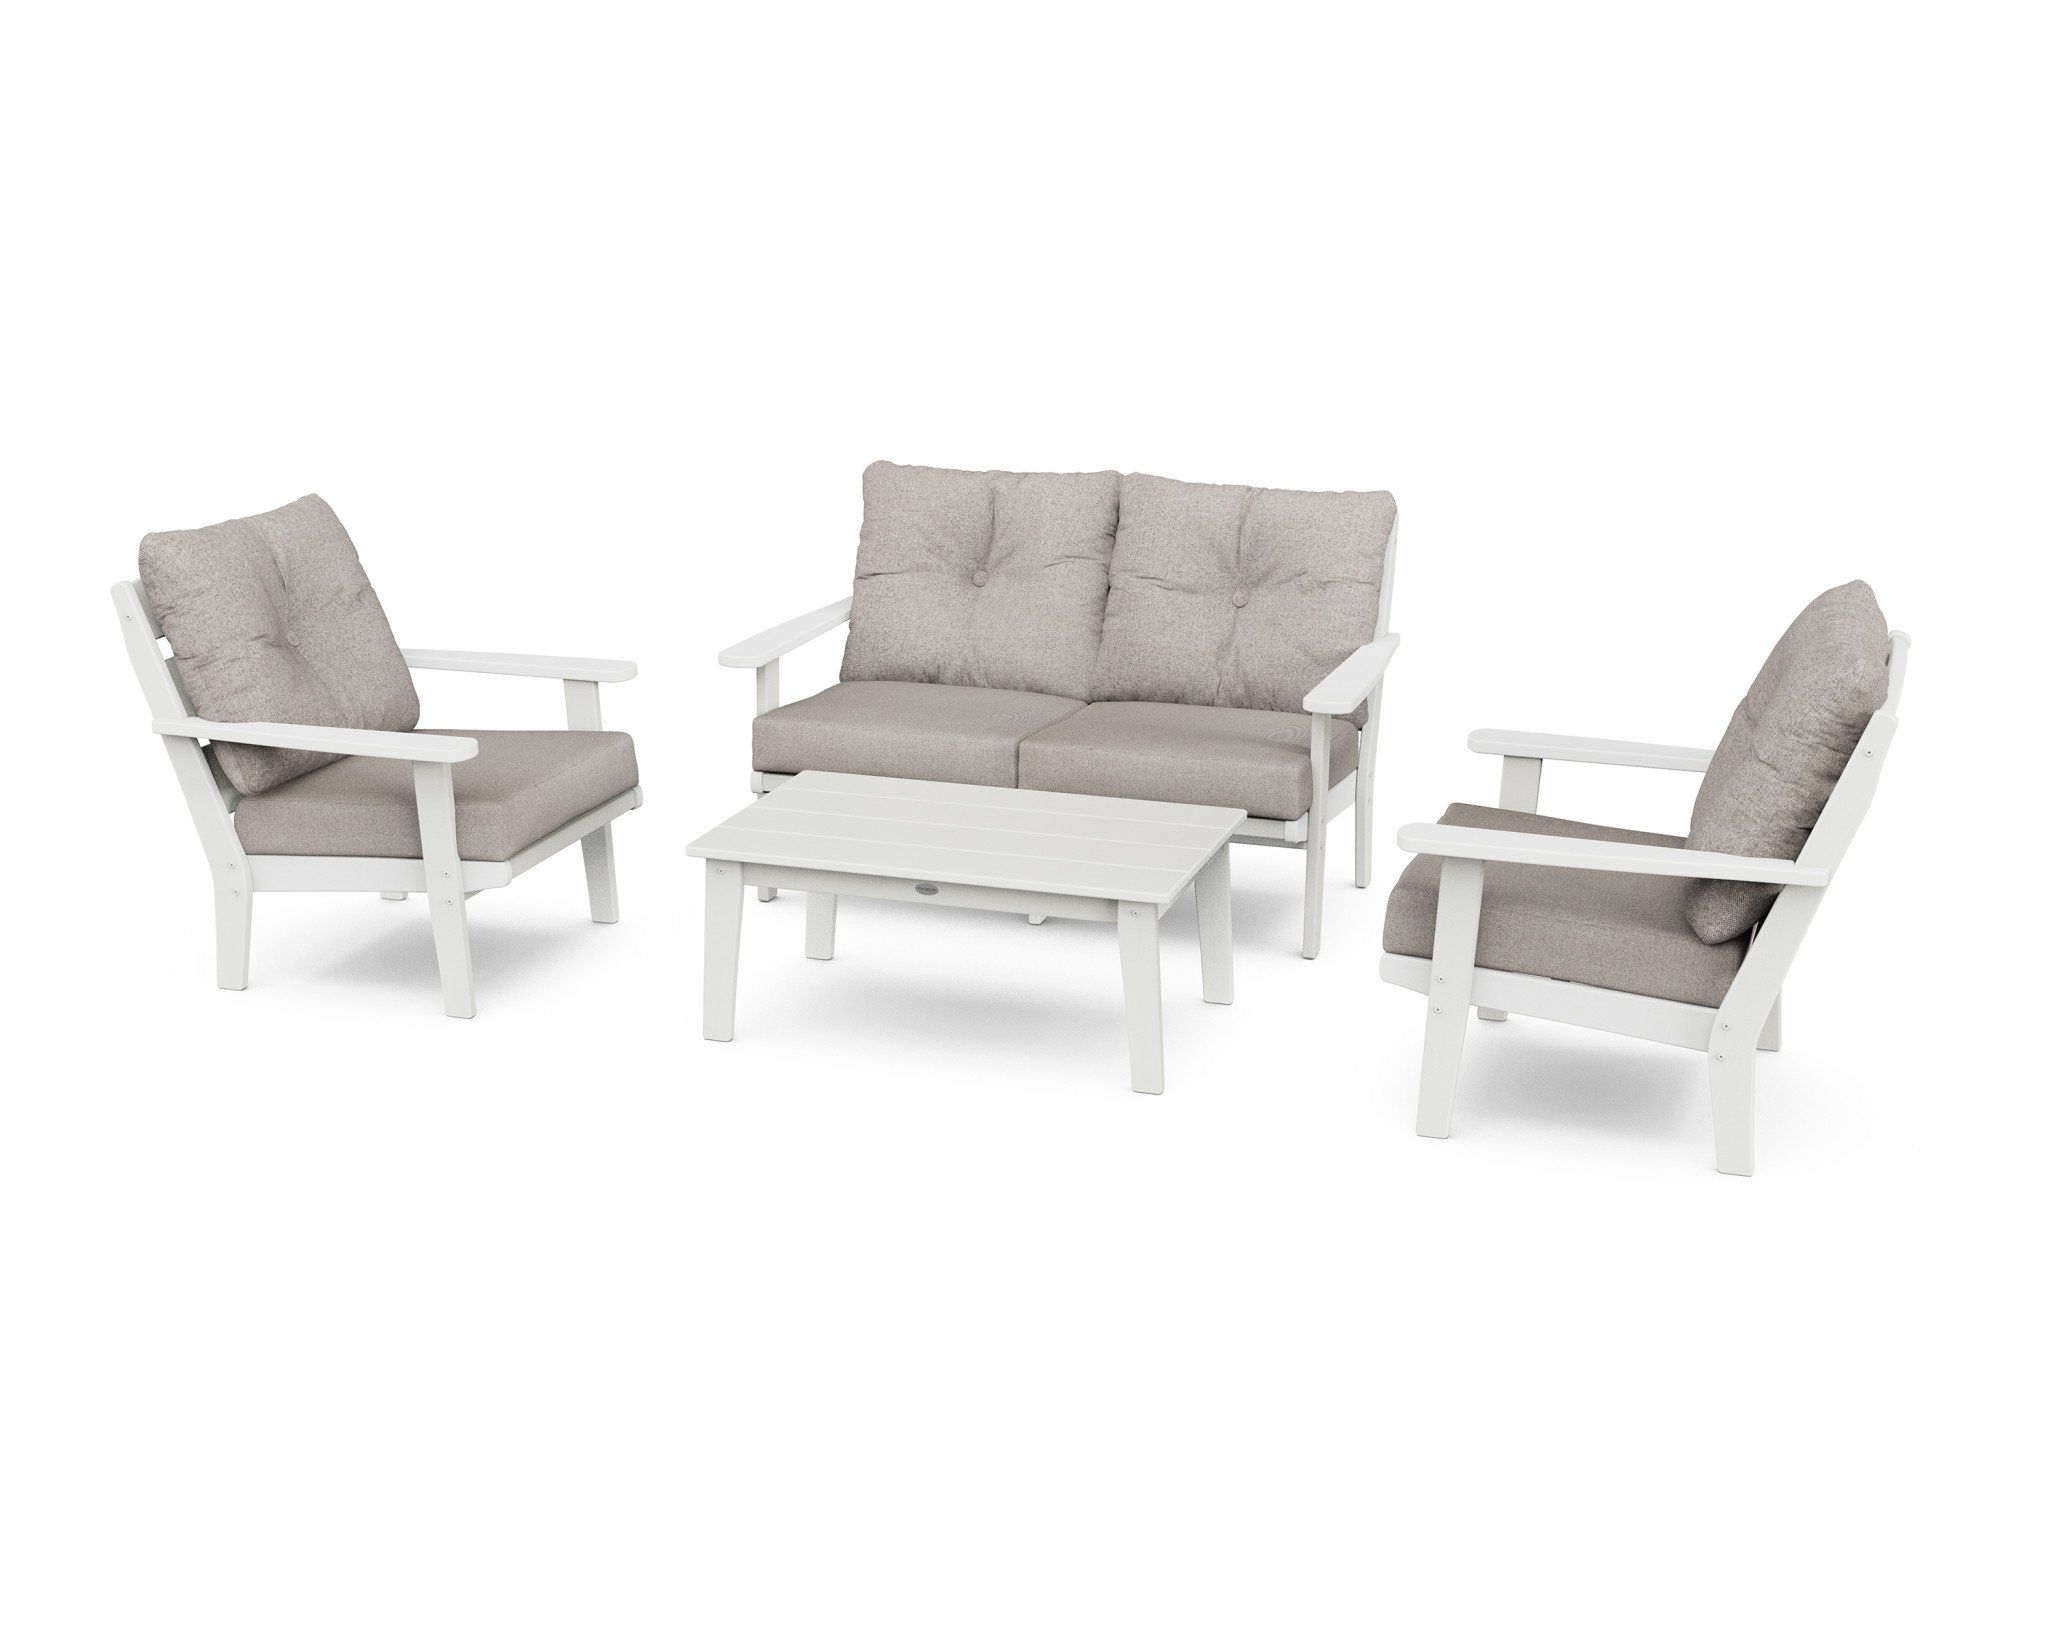 POLYWOOD® Lakeside 4-Piece Deep Seating Set - Vintage White / Weathered Tweed